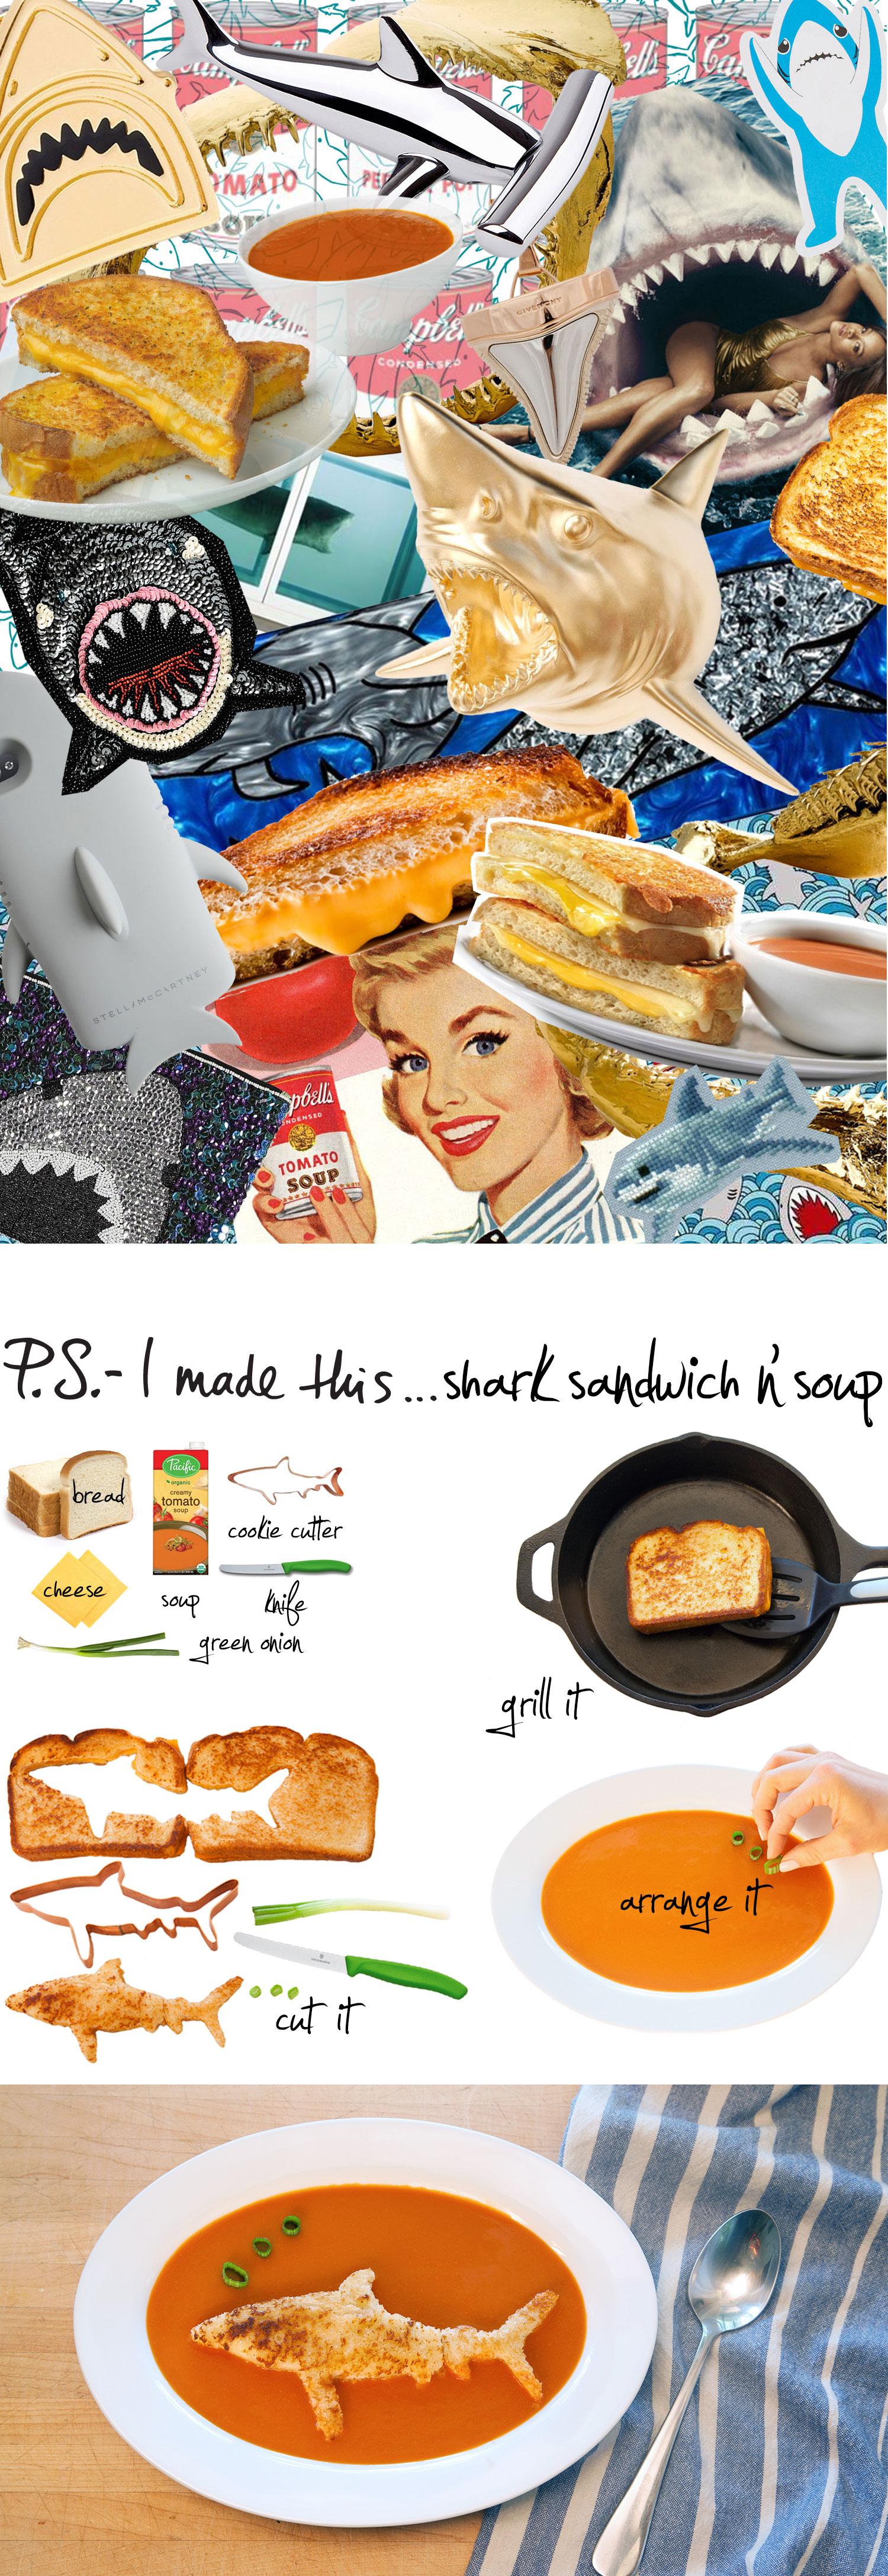 11.26.15_Shark-Sandwich-and-Soup